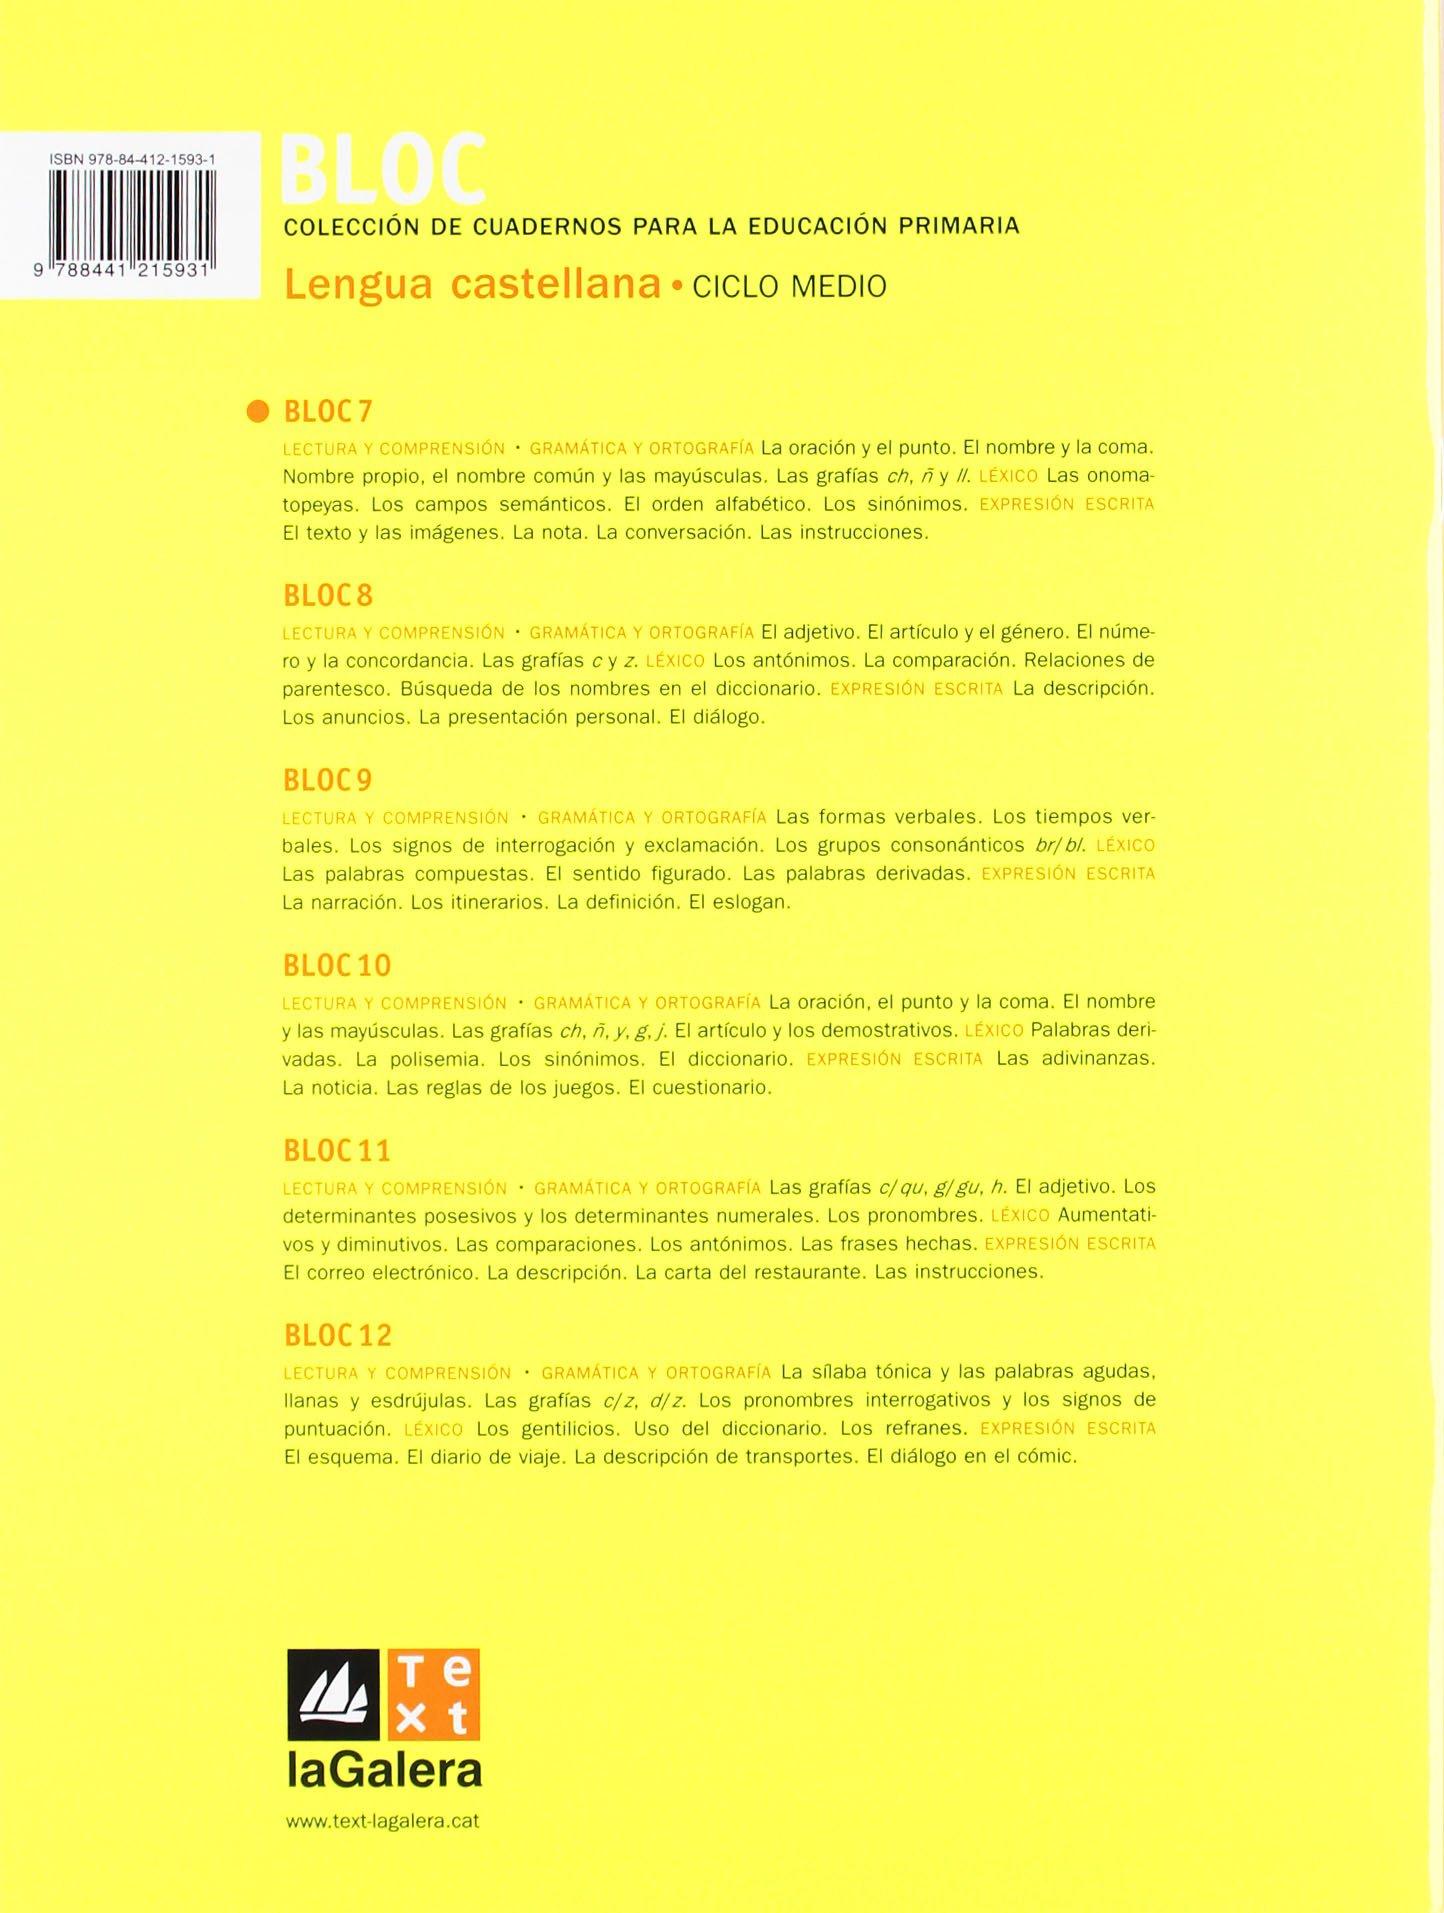 Bloc Lengua castellana 7: 9788441215931: Amazon.com: Books